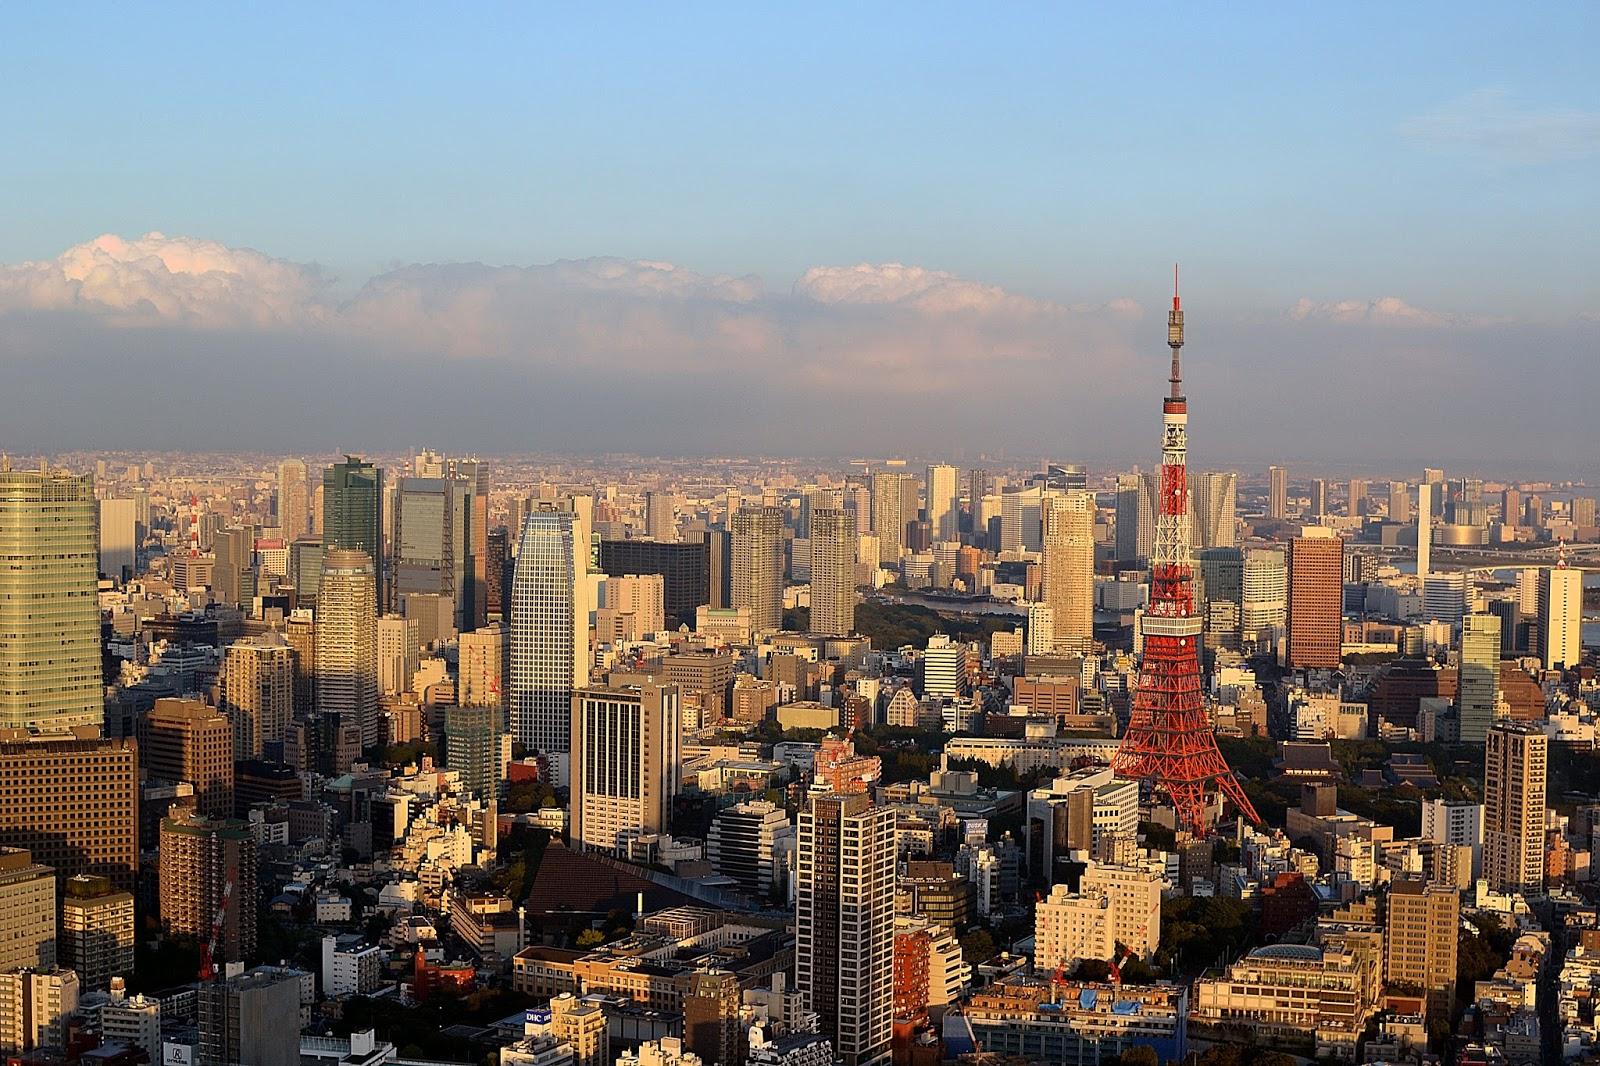 Mori arts centre, rappongi hills, center, tokyo tower, view, must do tokyo, Japan